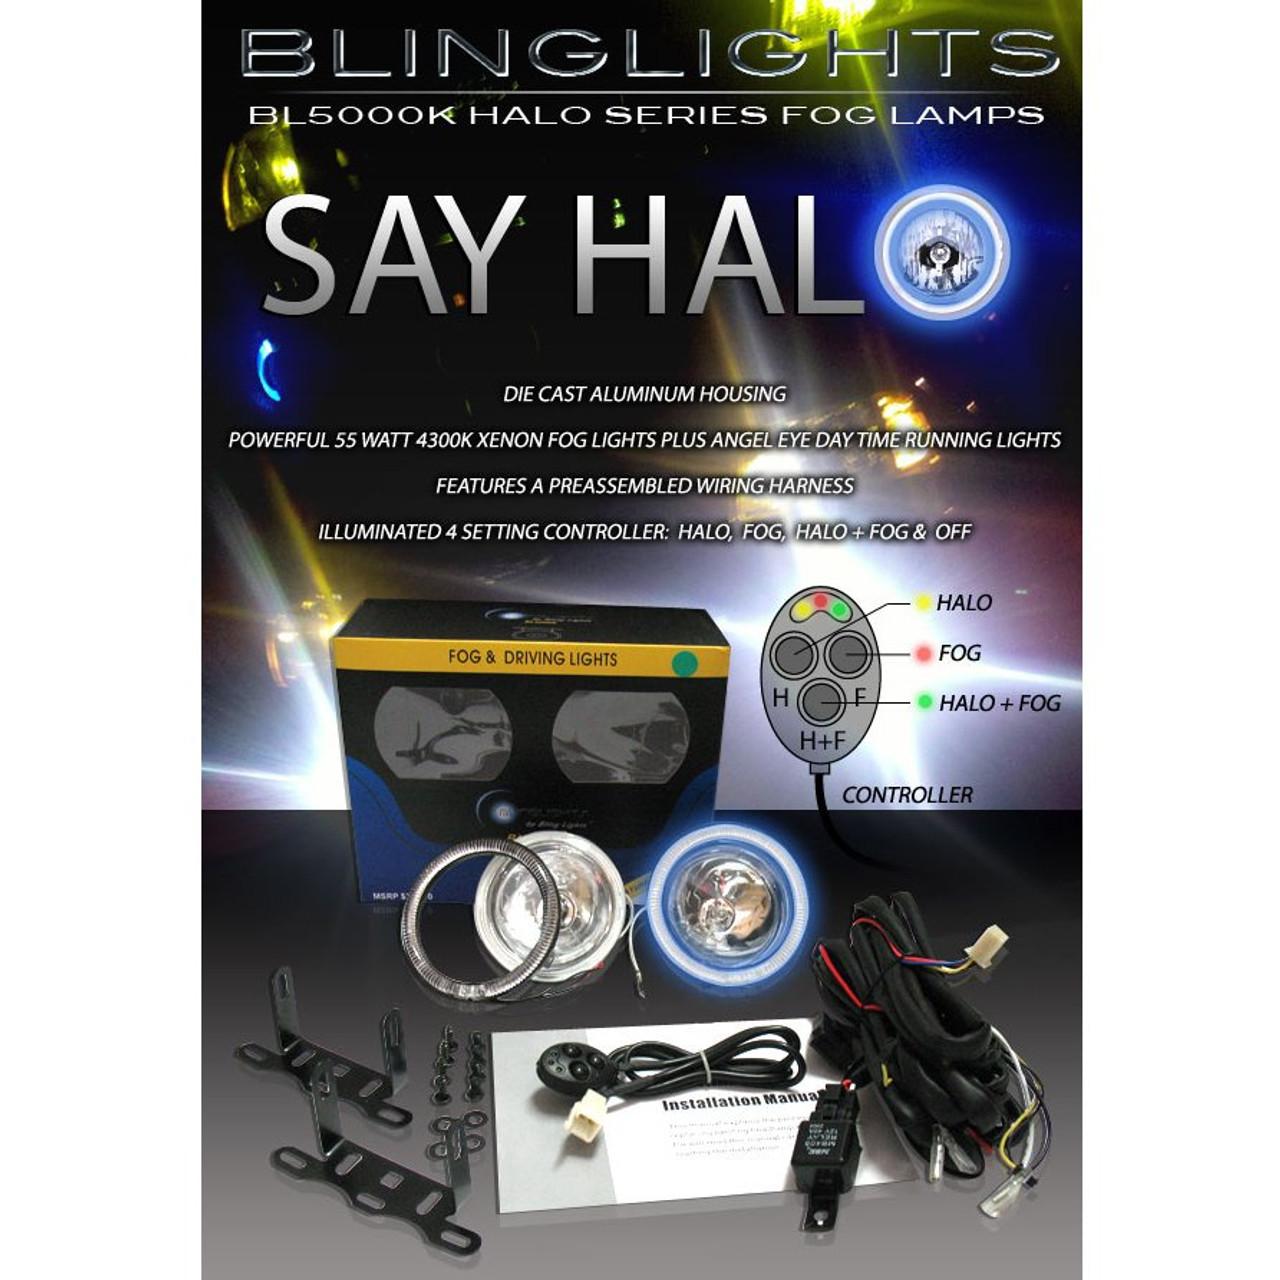 2005 2006 2007 2008 2009 2010 2011 Alfa Romeo 159 Angel Eye Fog Lamps Halo Driving Lights Foglamps